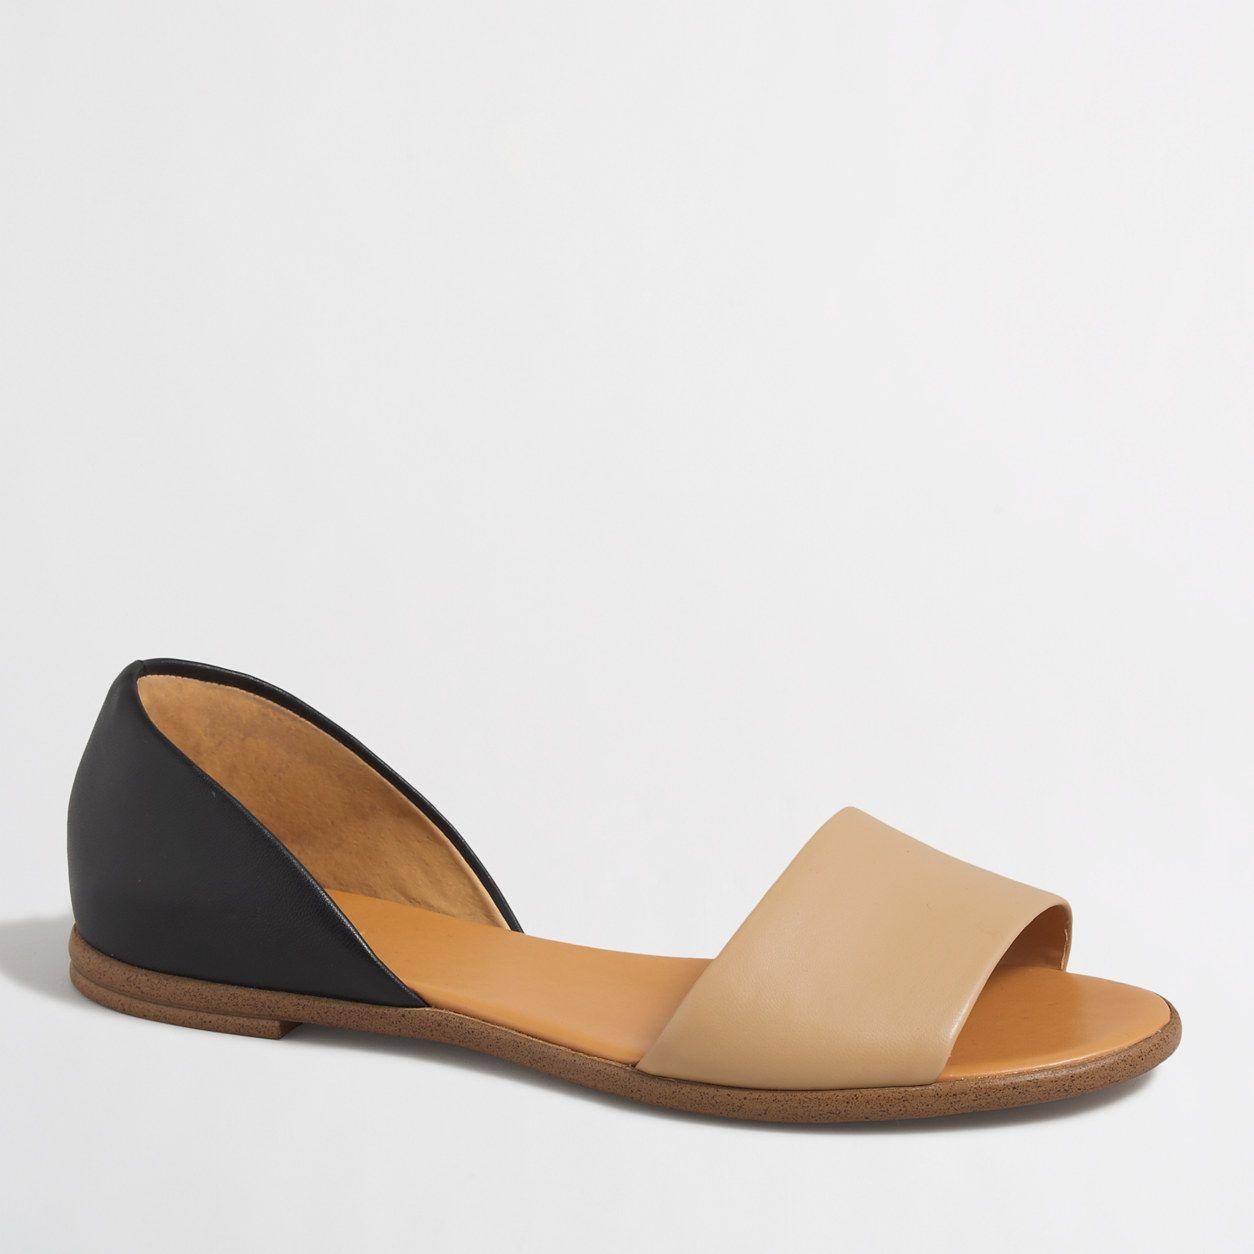 ff85156e336 Colorblock peep-toe d'Orsay flats : FactoryWomen Sandals | Shoe ...